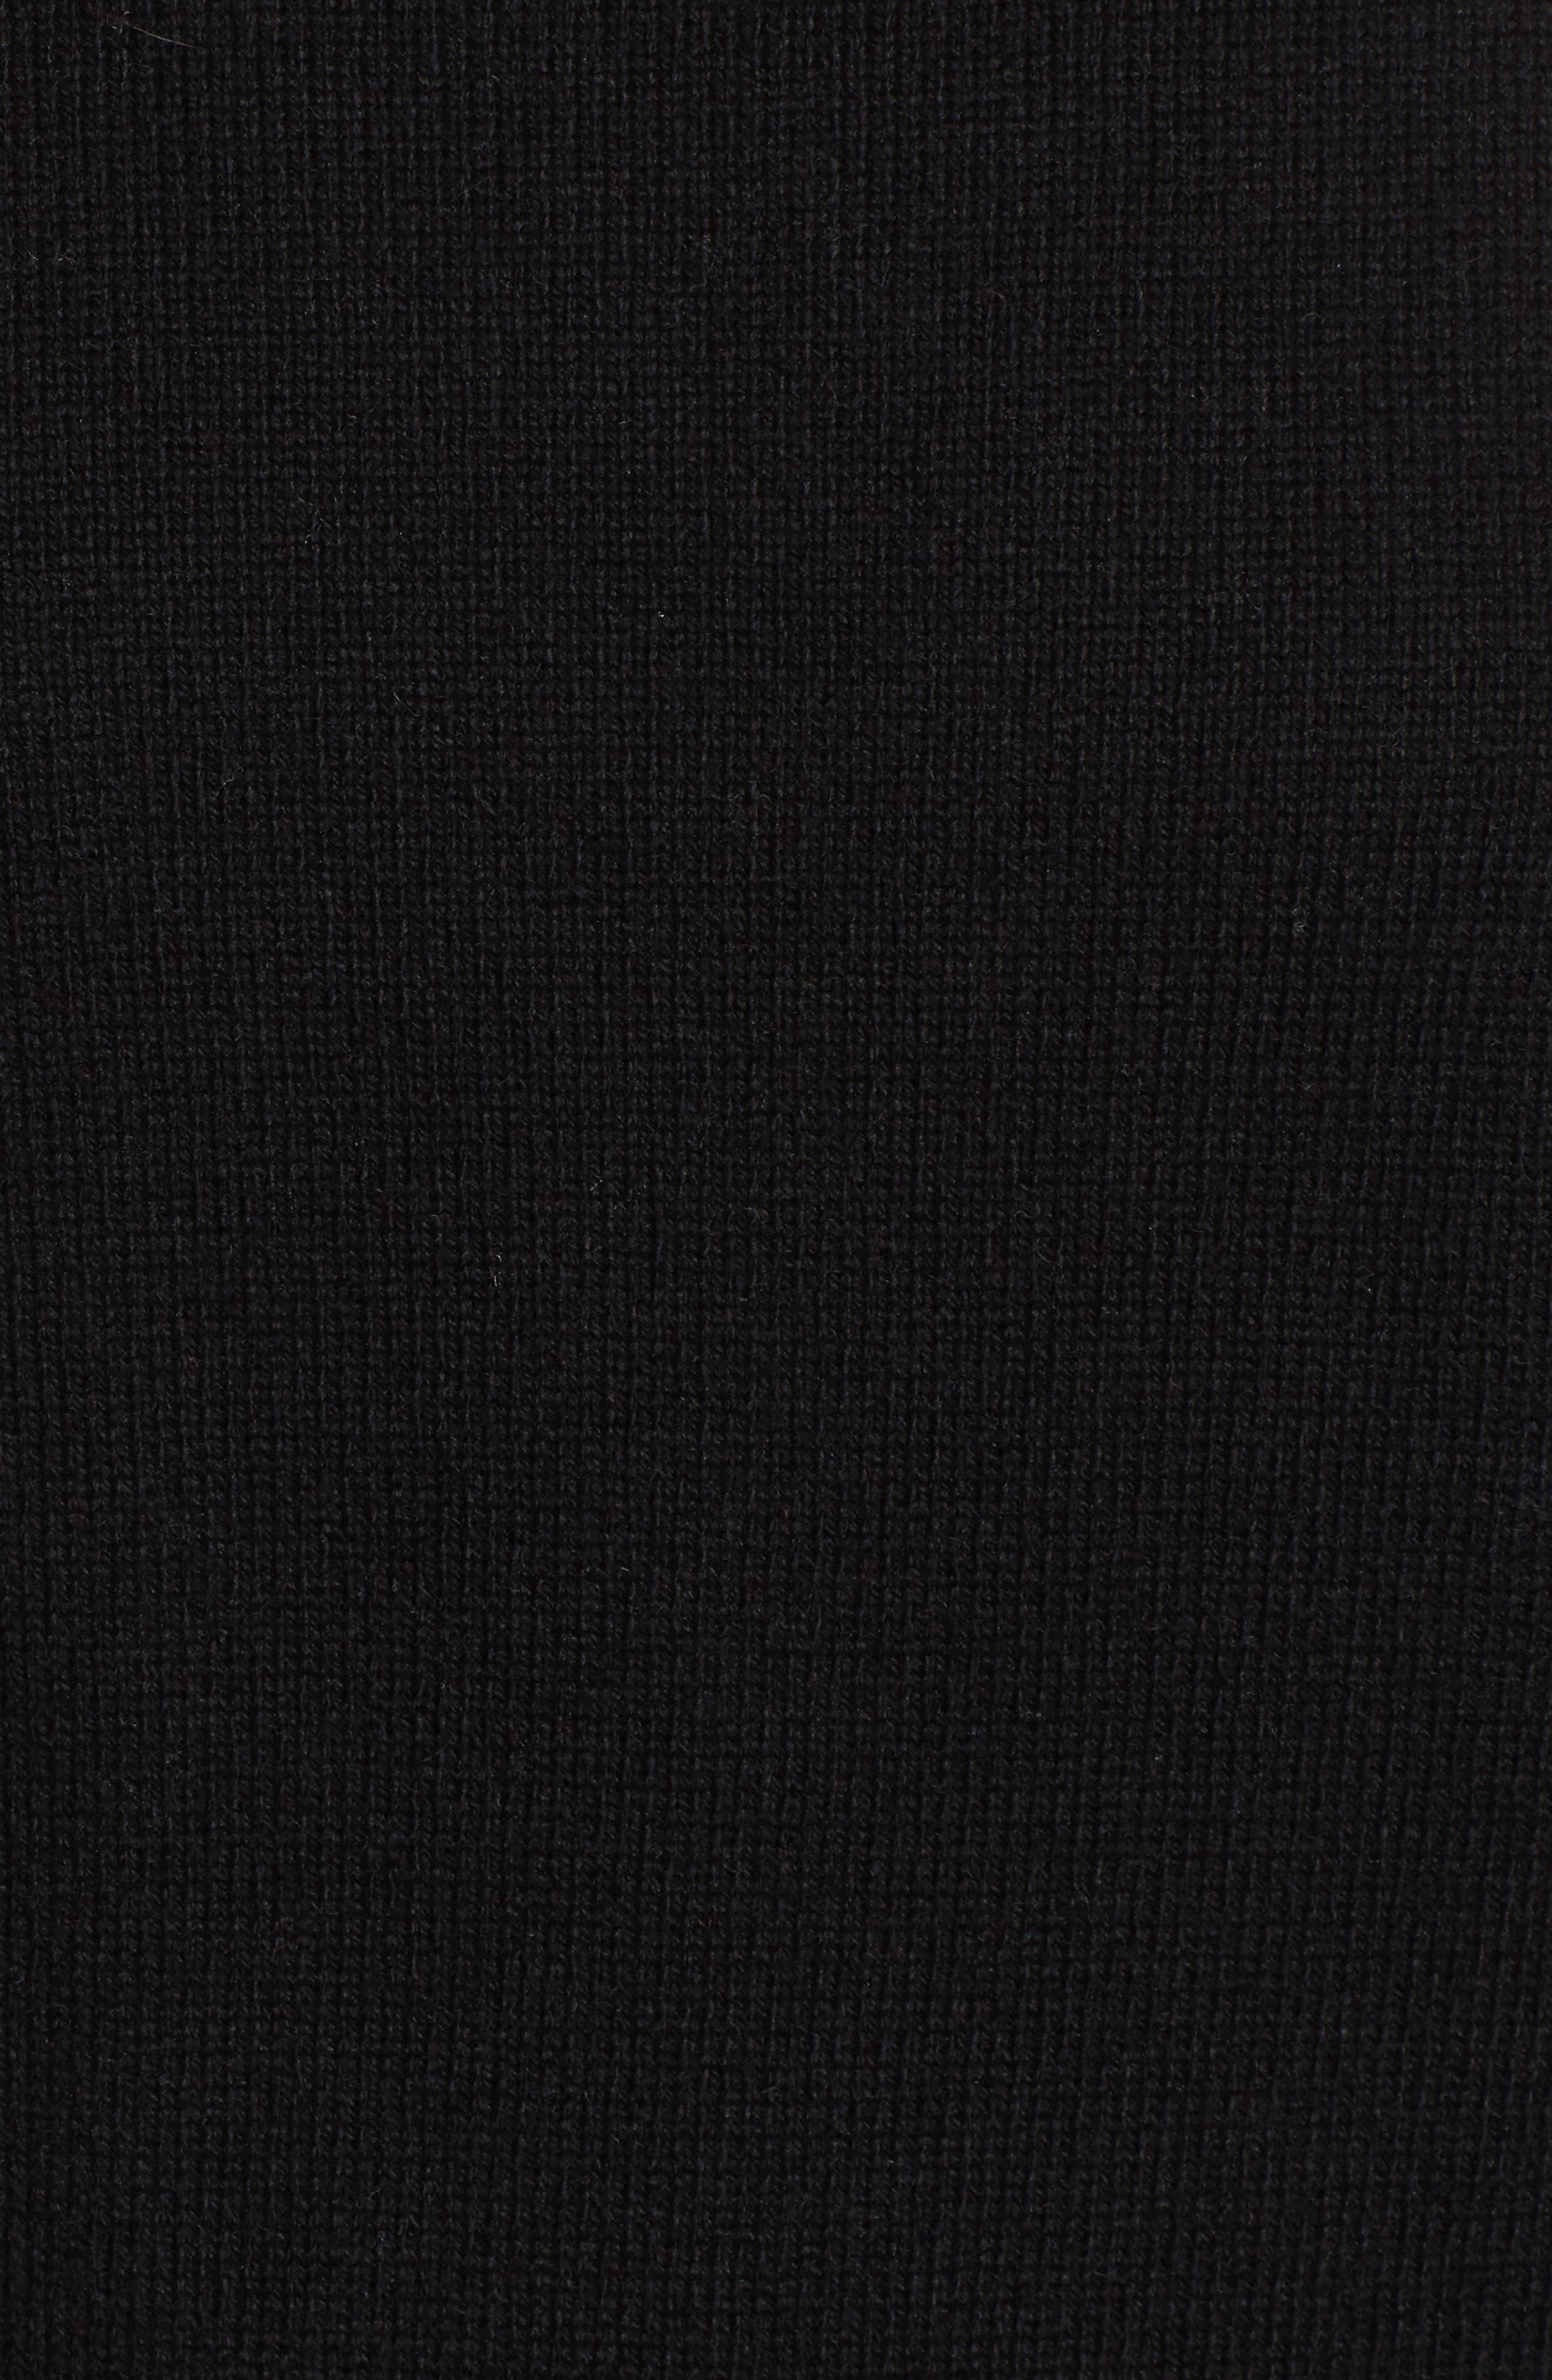 Bateau Neck Blouson Sleeve Sweater,                             Alternate thumbnail 5, color,                             001